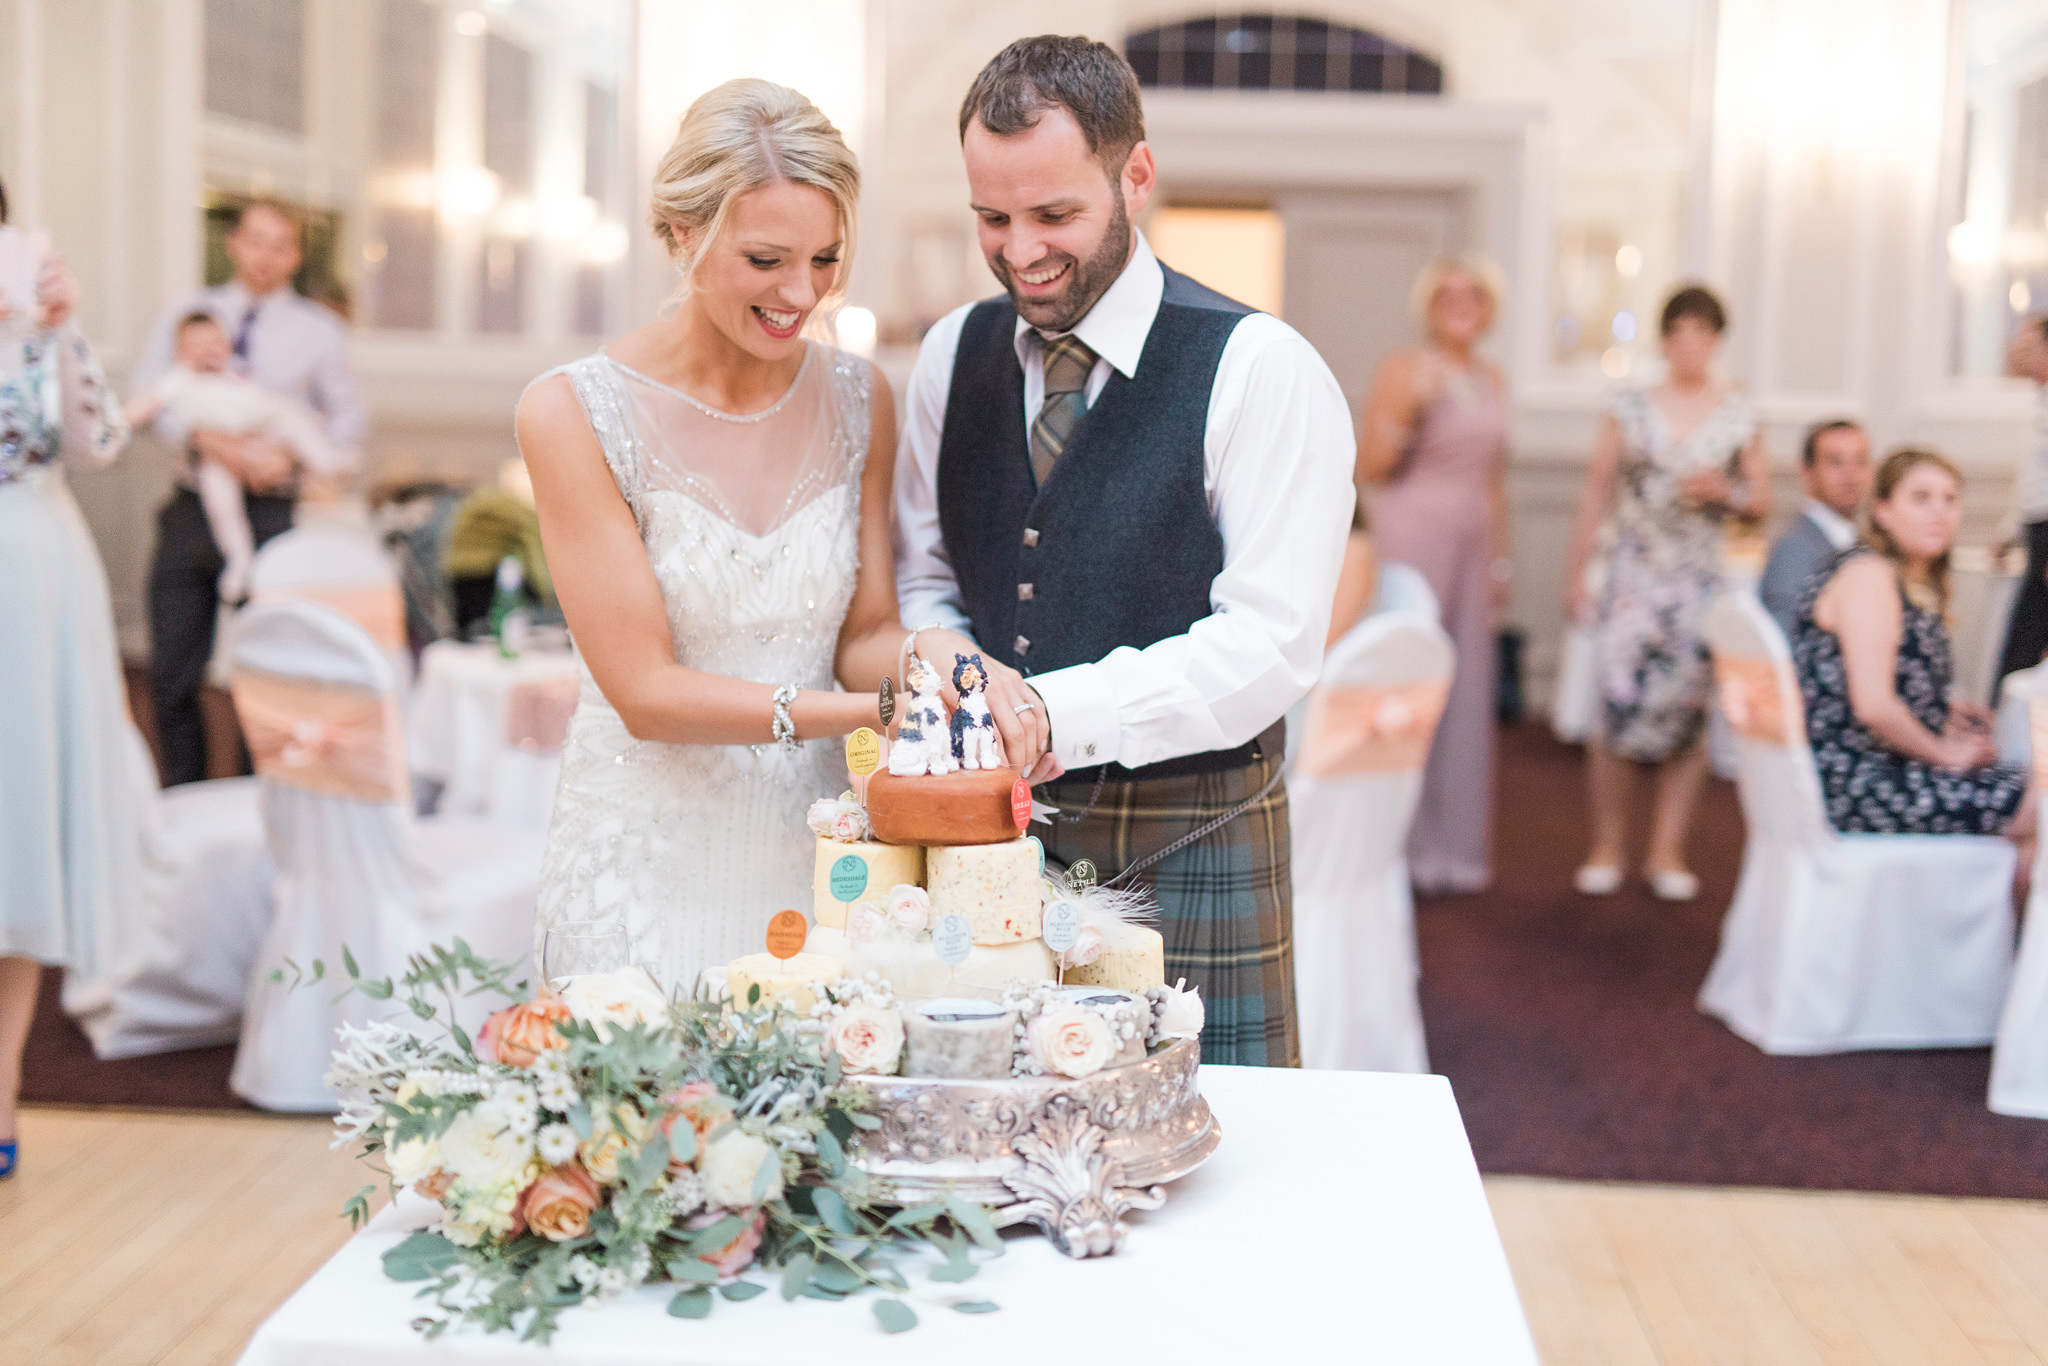 115-destination-wedding-photography.jpg